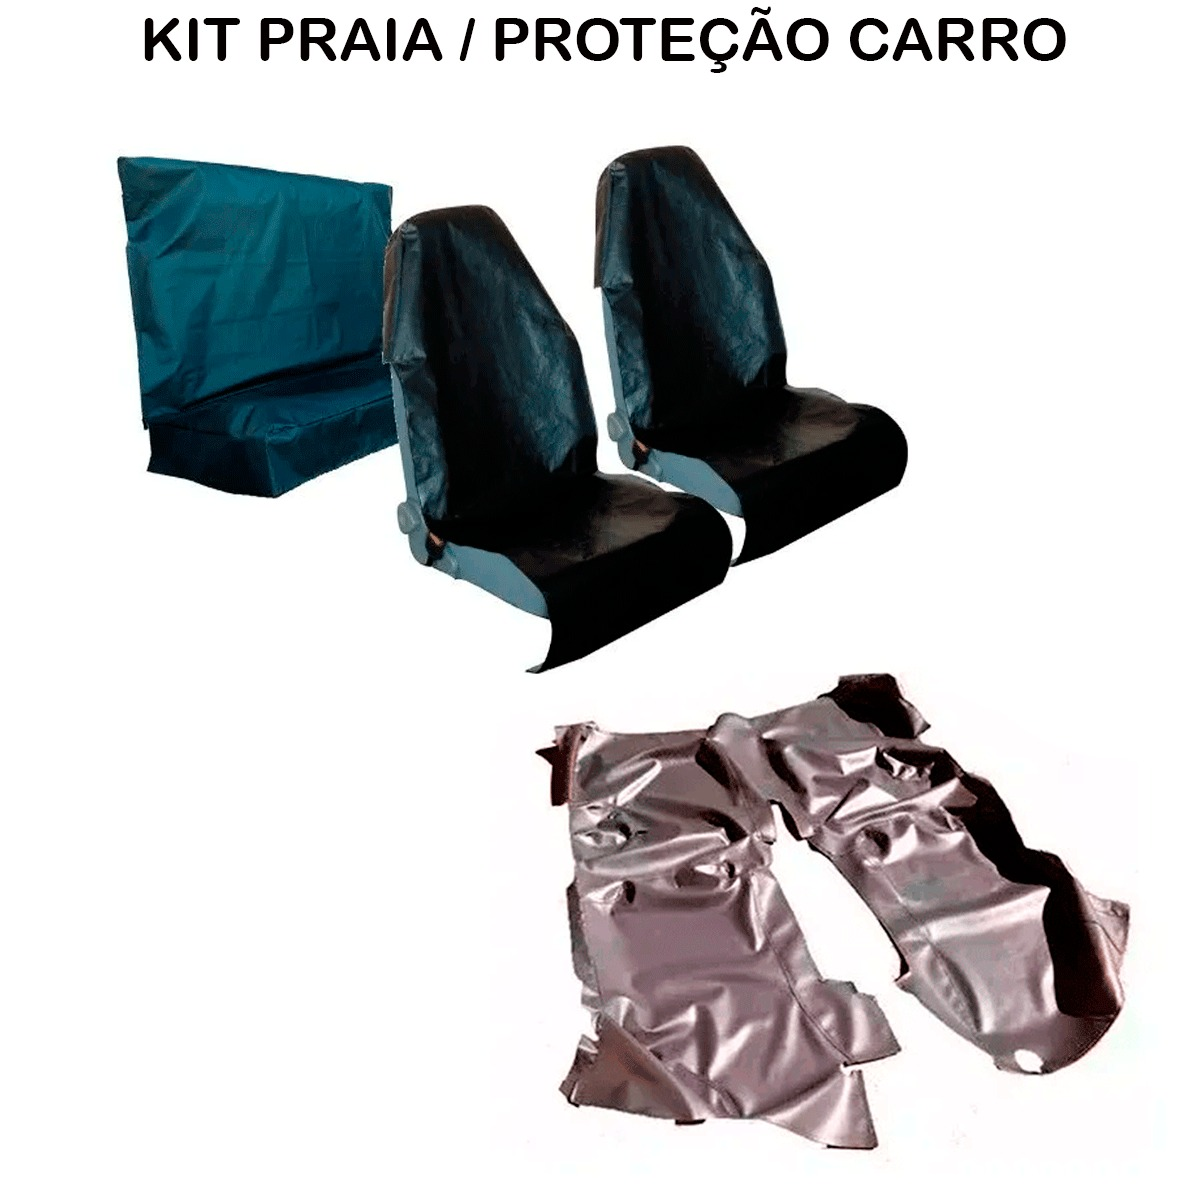 Tapete Em Vinil Volkswagen Brasilia + Capa Banco Protecao Banco Areia Suor Academia